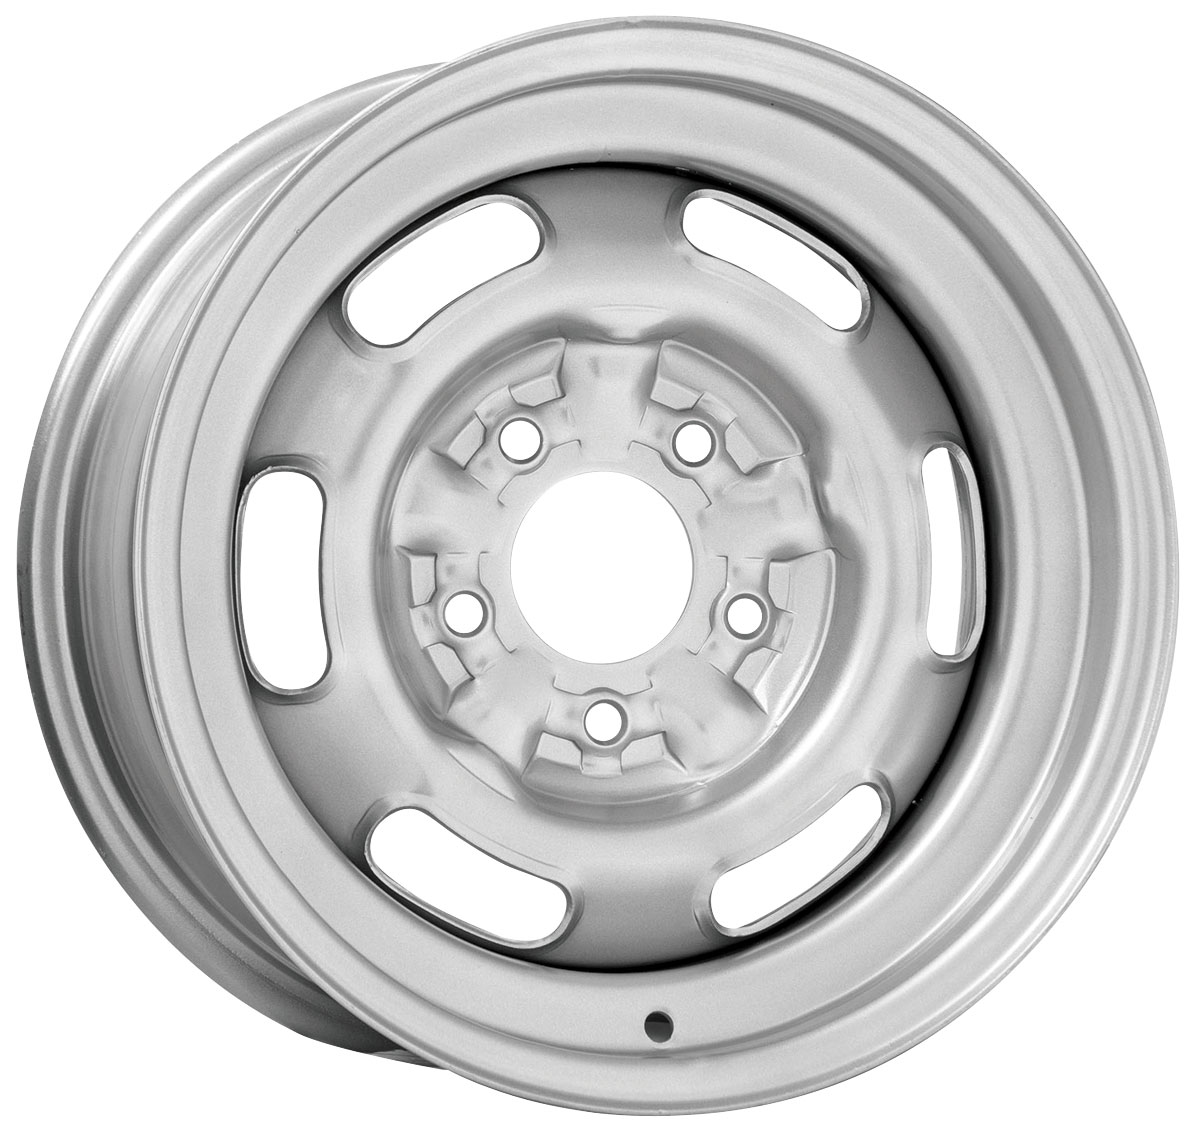 "Wheel, Pontiac Rally I, 15X8, 5"" Back Spacing"